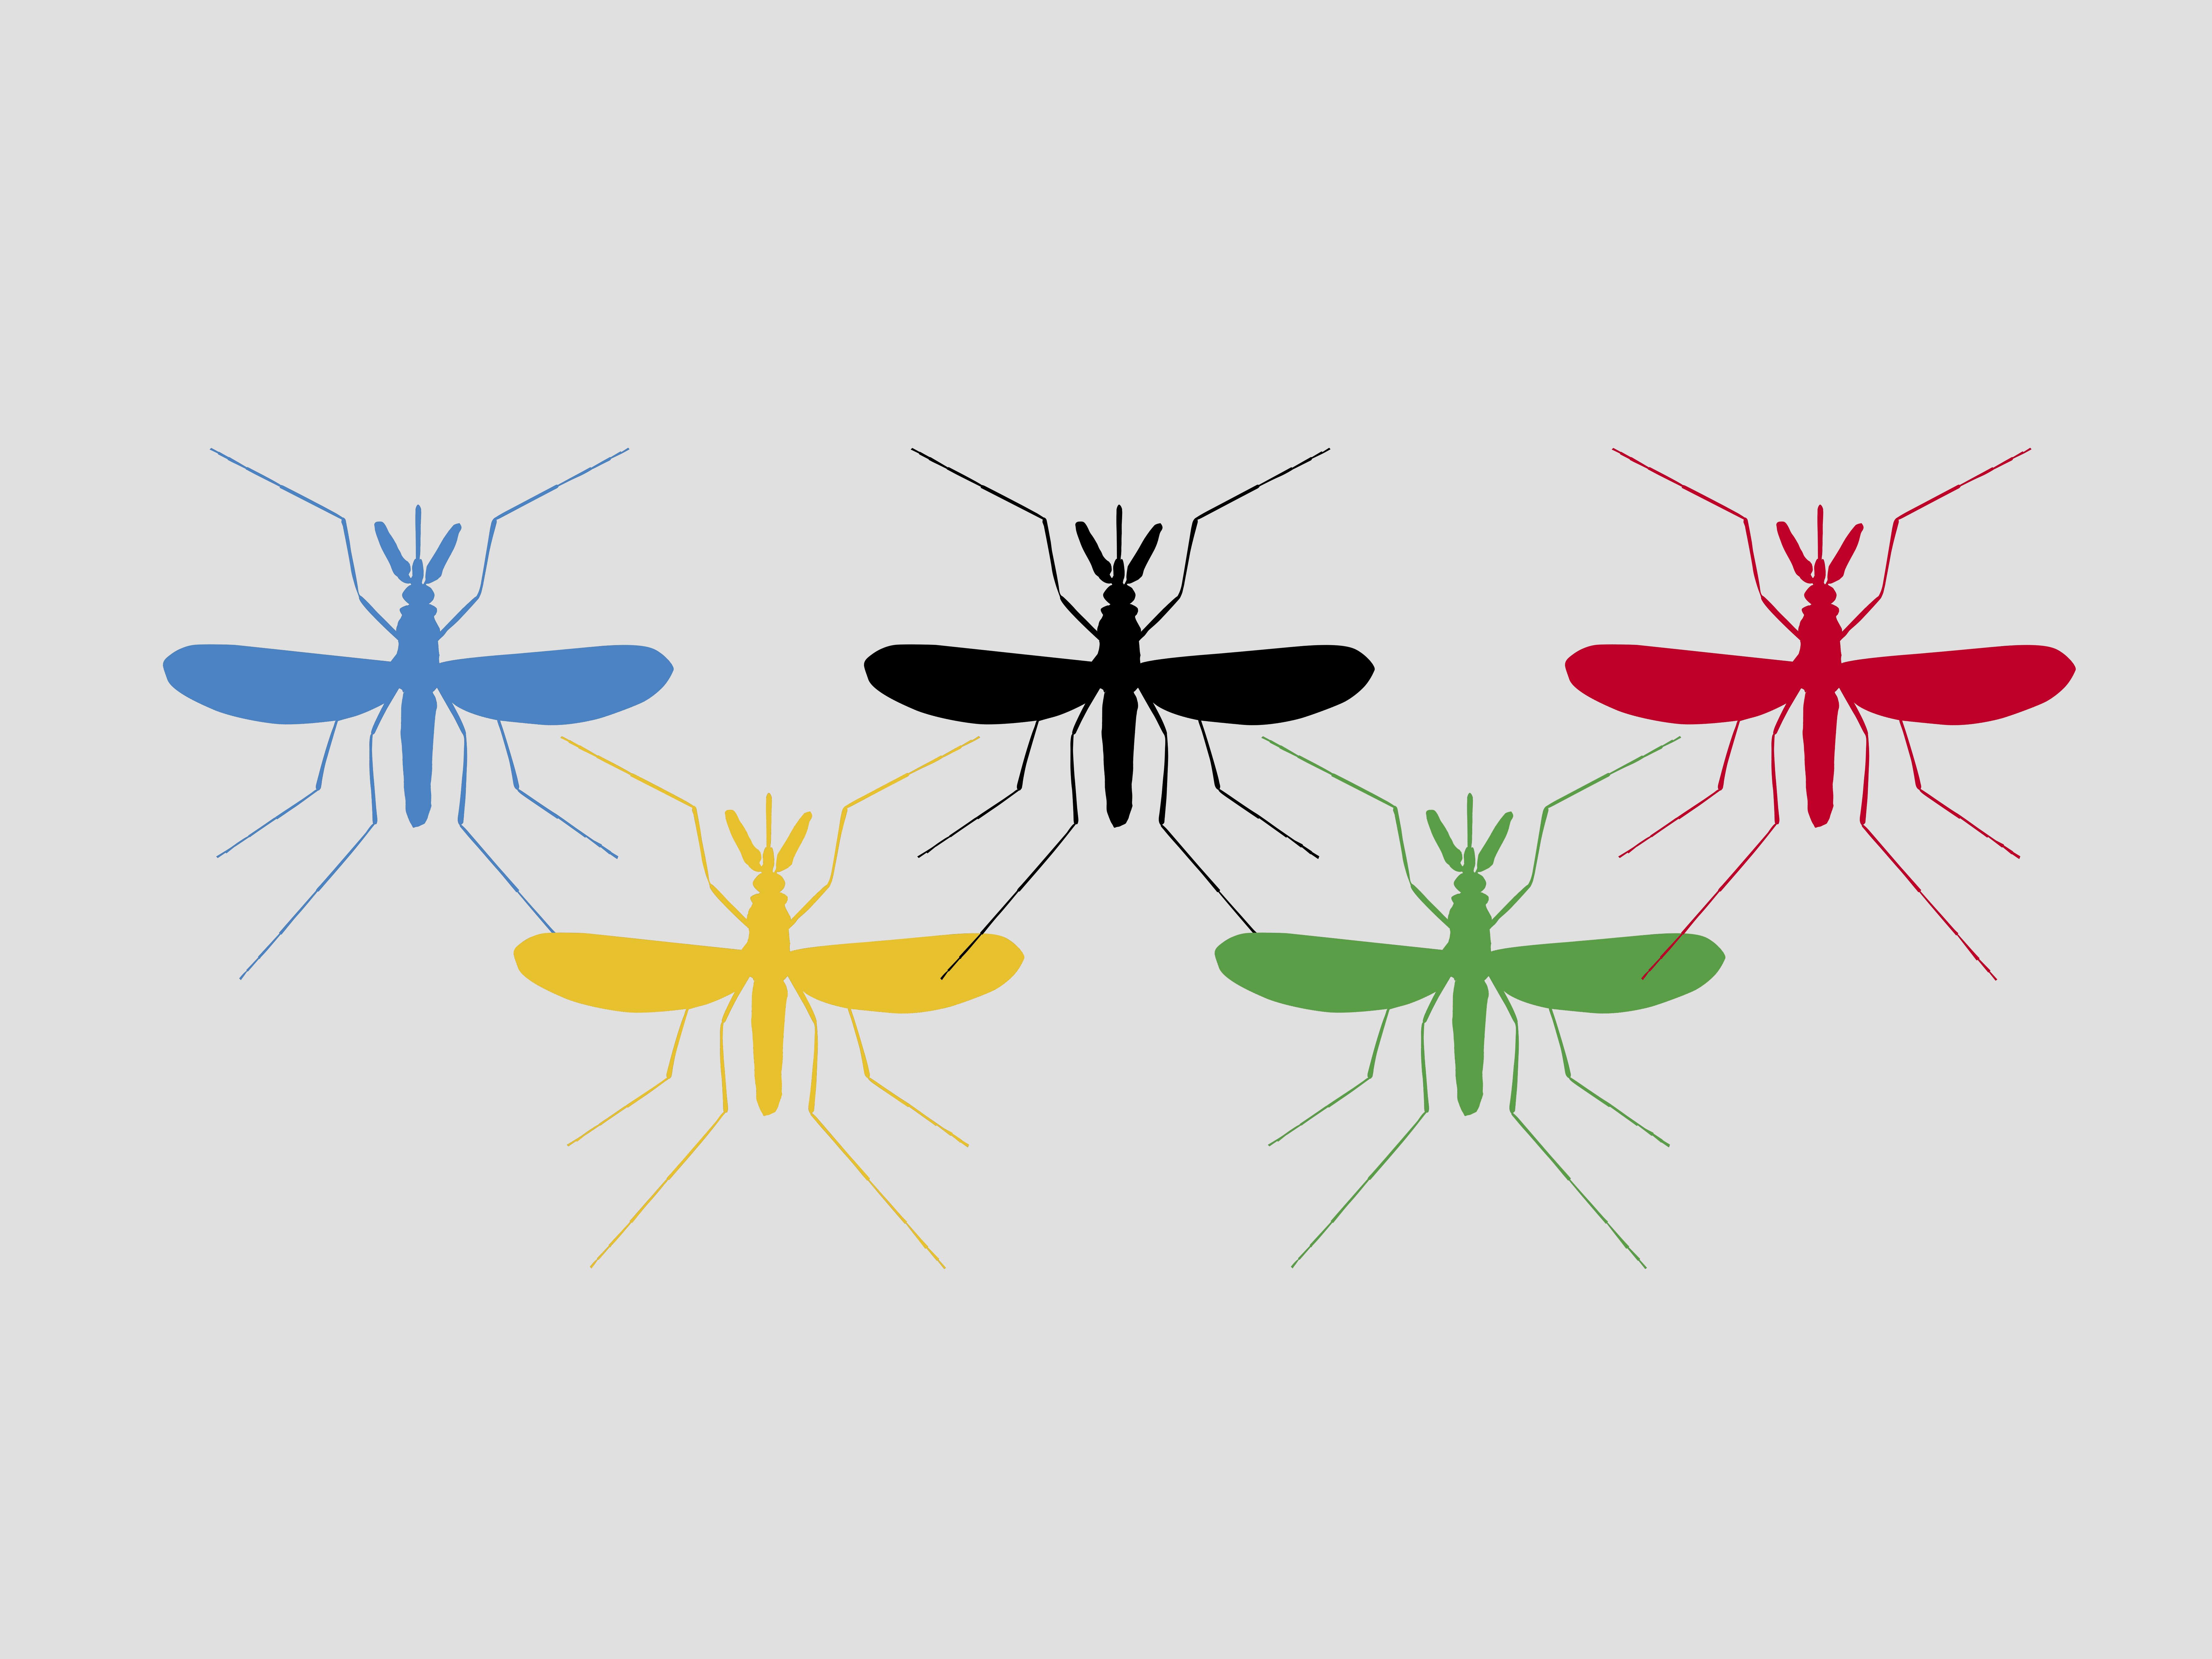 Mosquito seen under microscope (x6), Culicidae